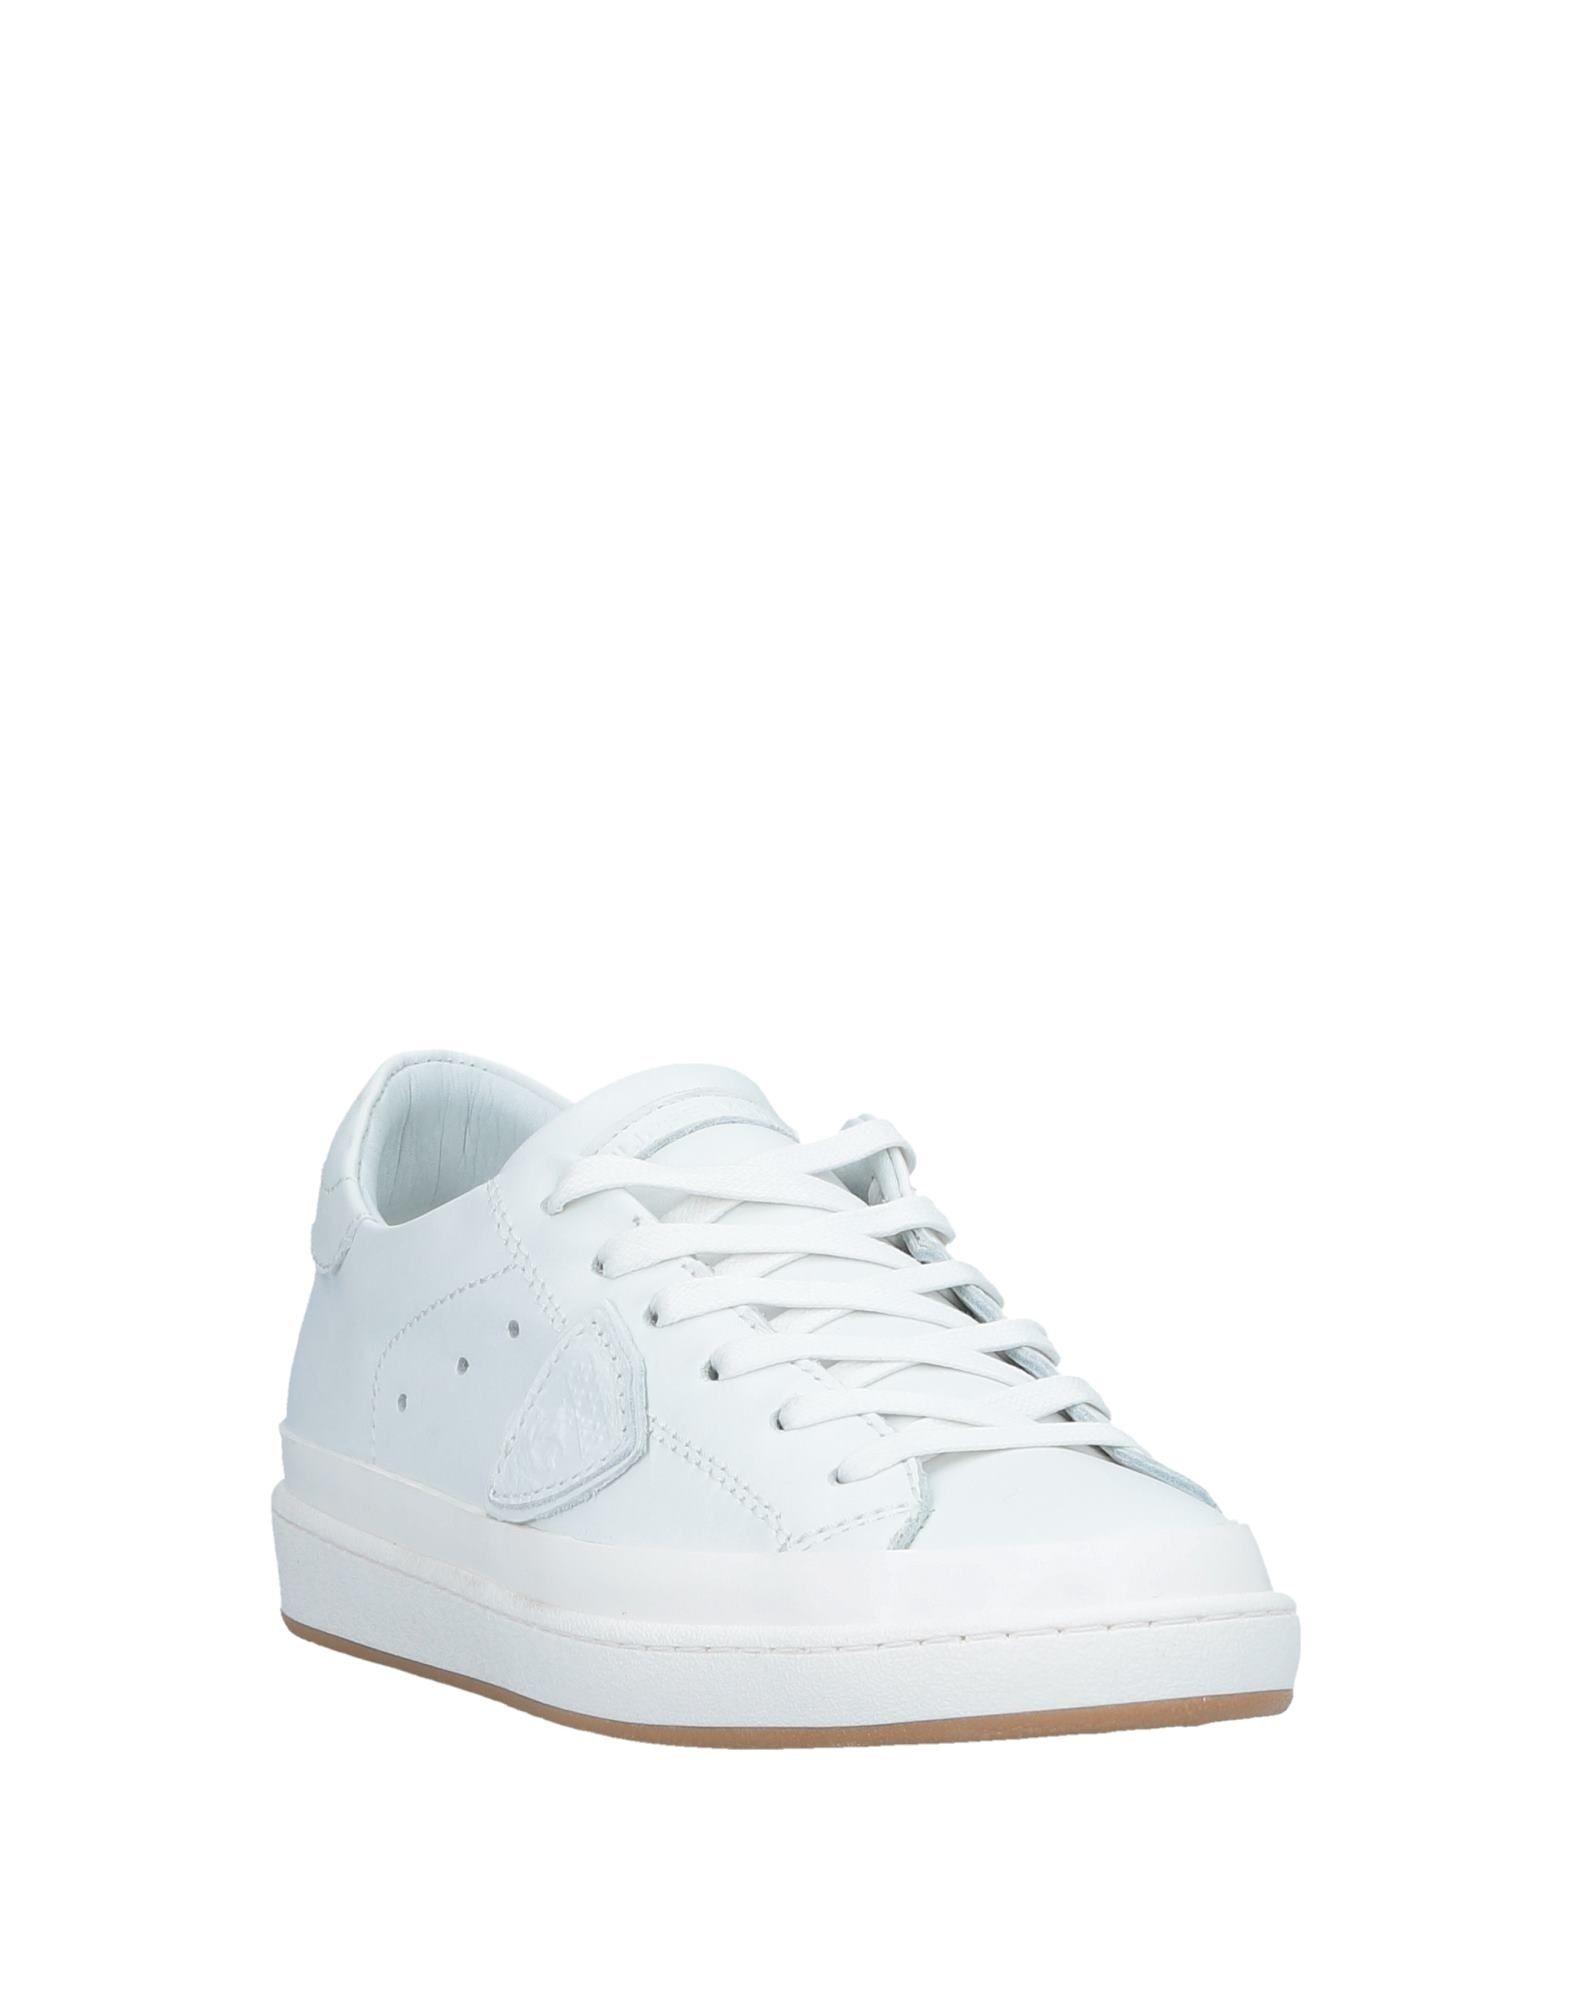 Philippe Model Sneakers - Women Philippe Model Sneakers Sneakers Sneakers online on  United Kingdom - 11531014NI 31c5af